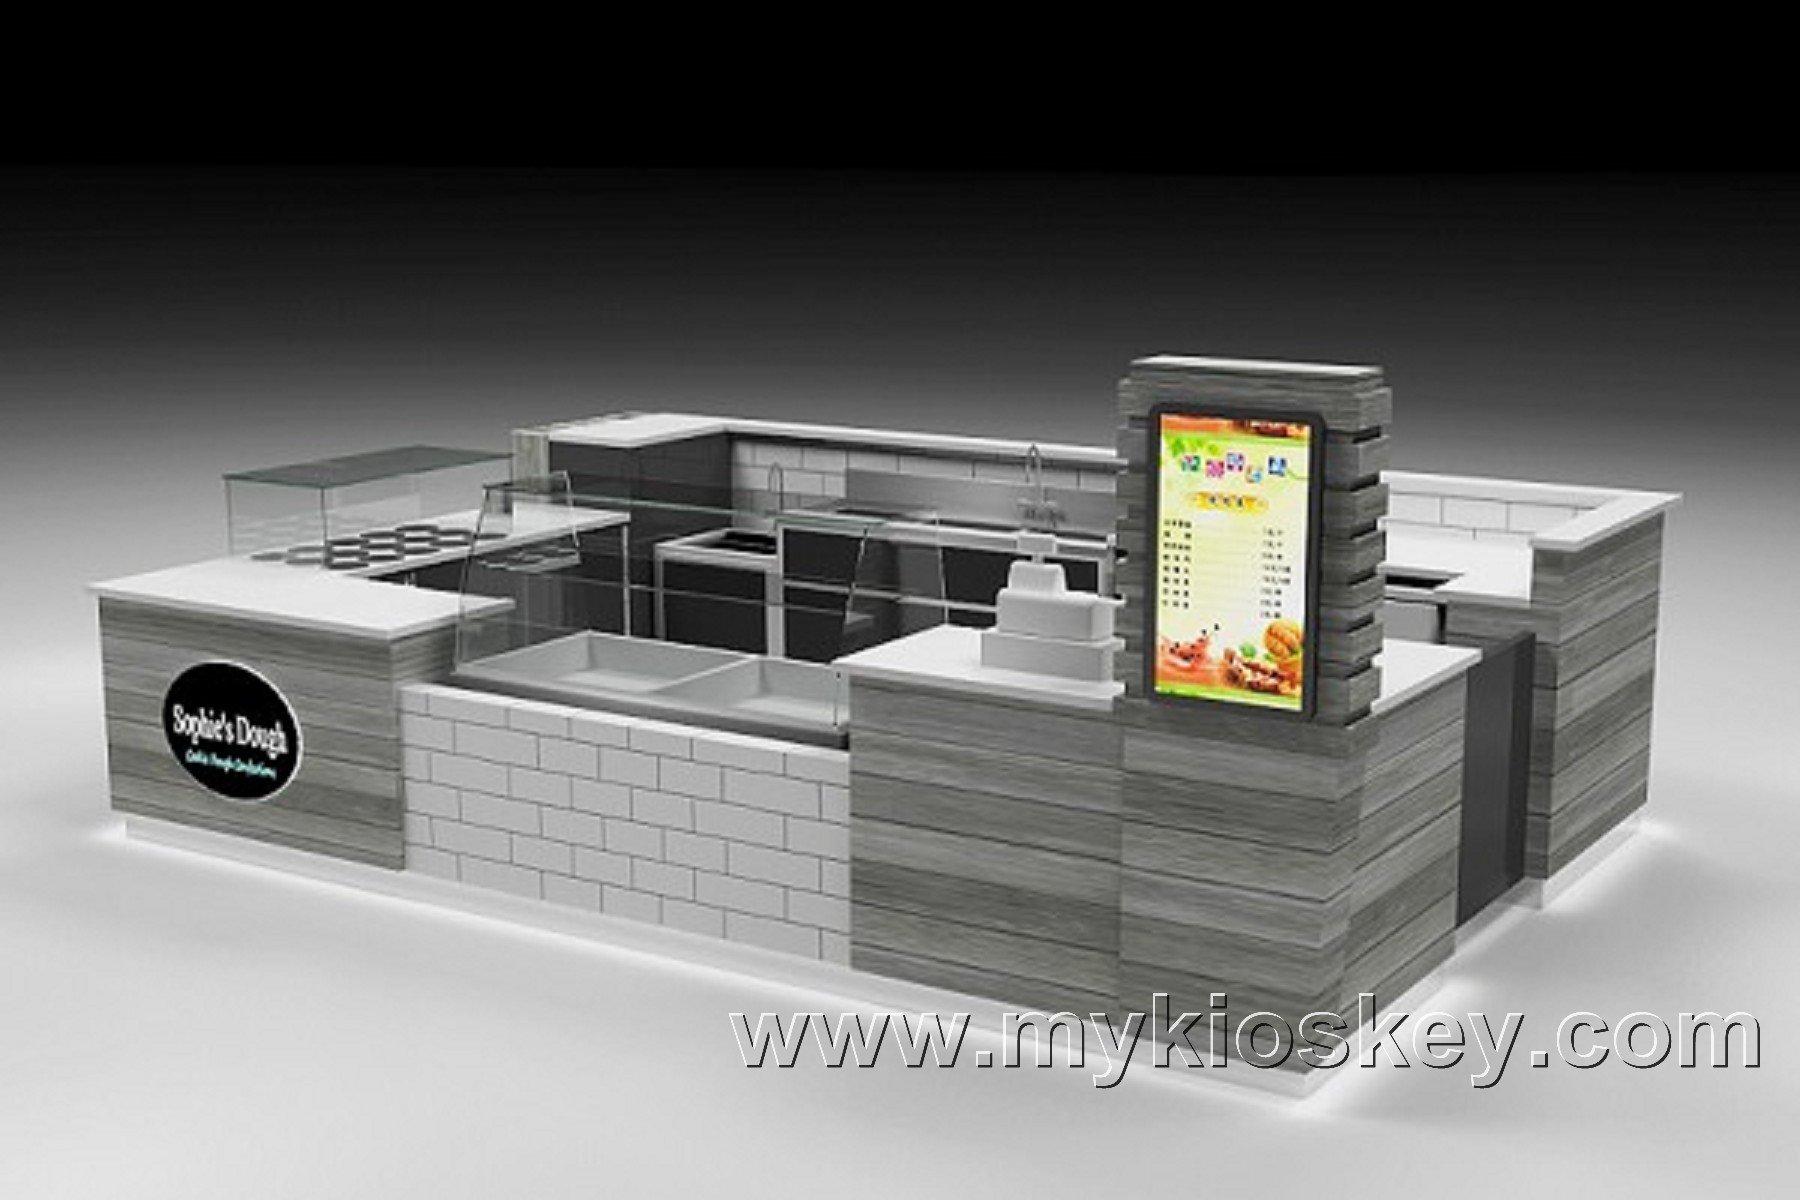 yogurt food kiosk